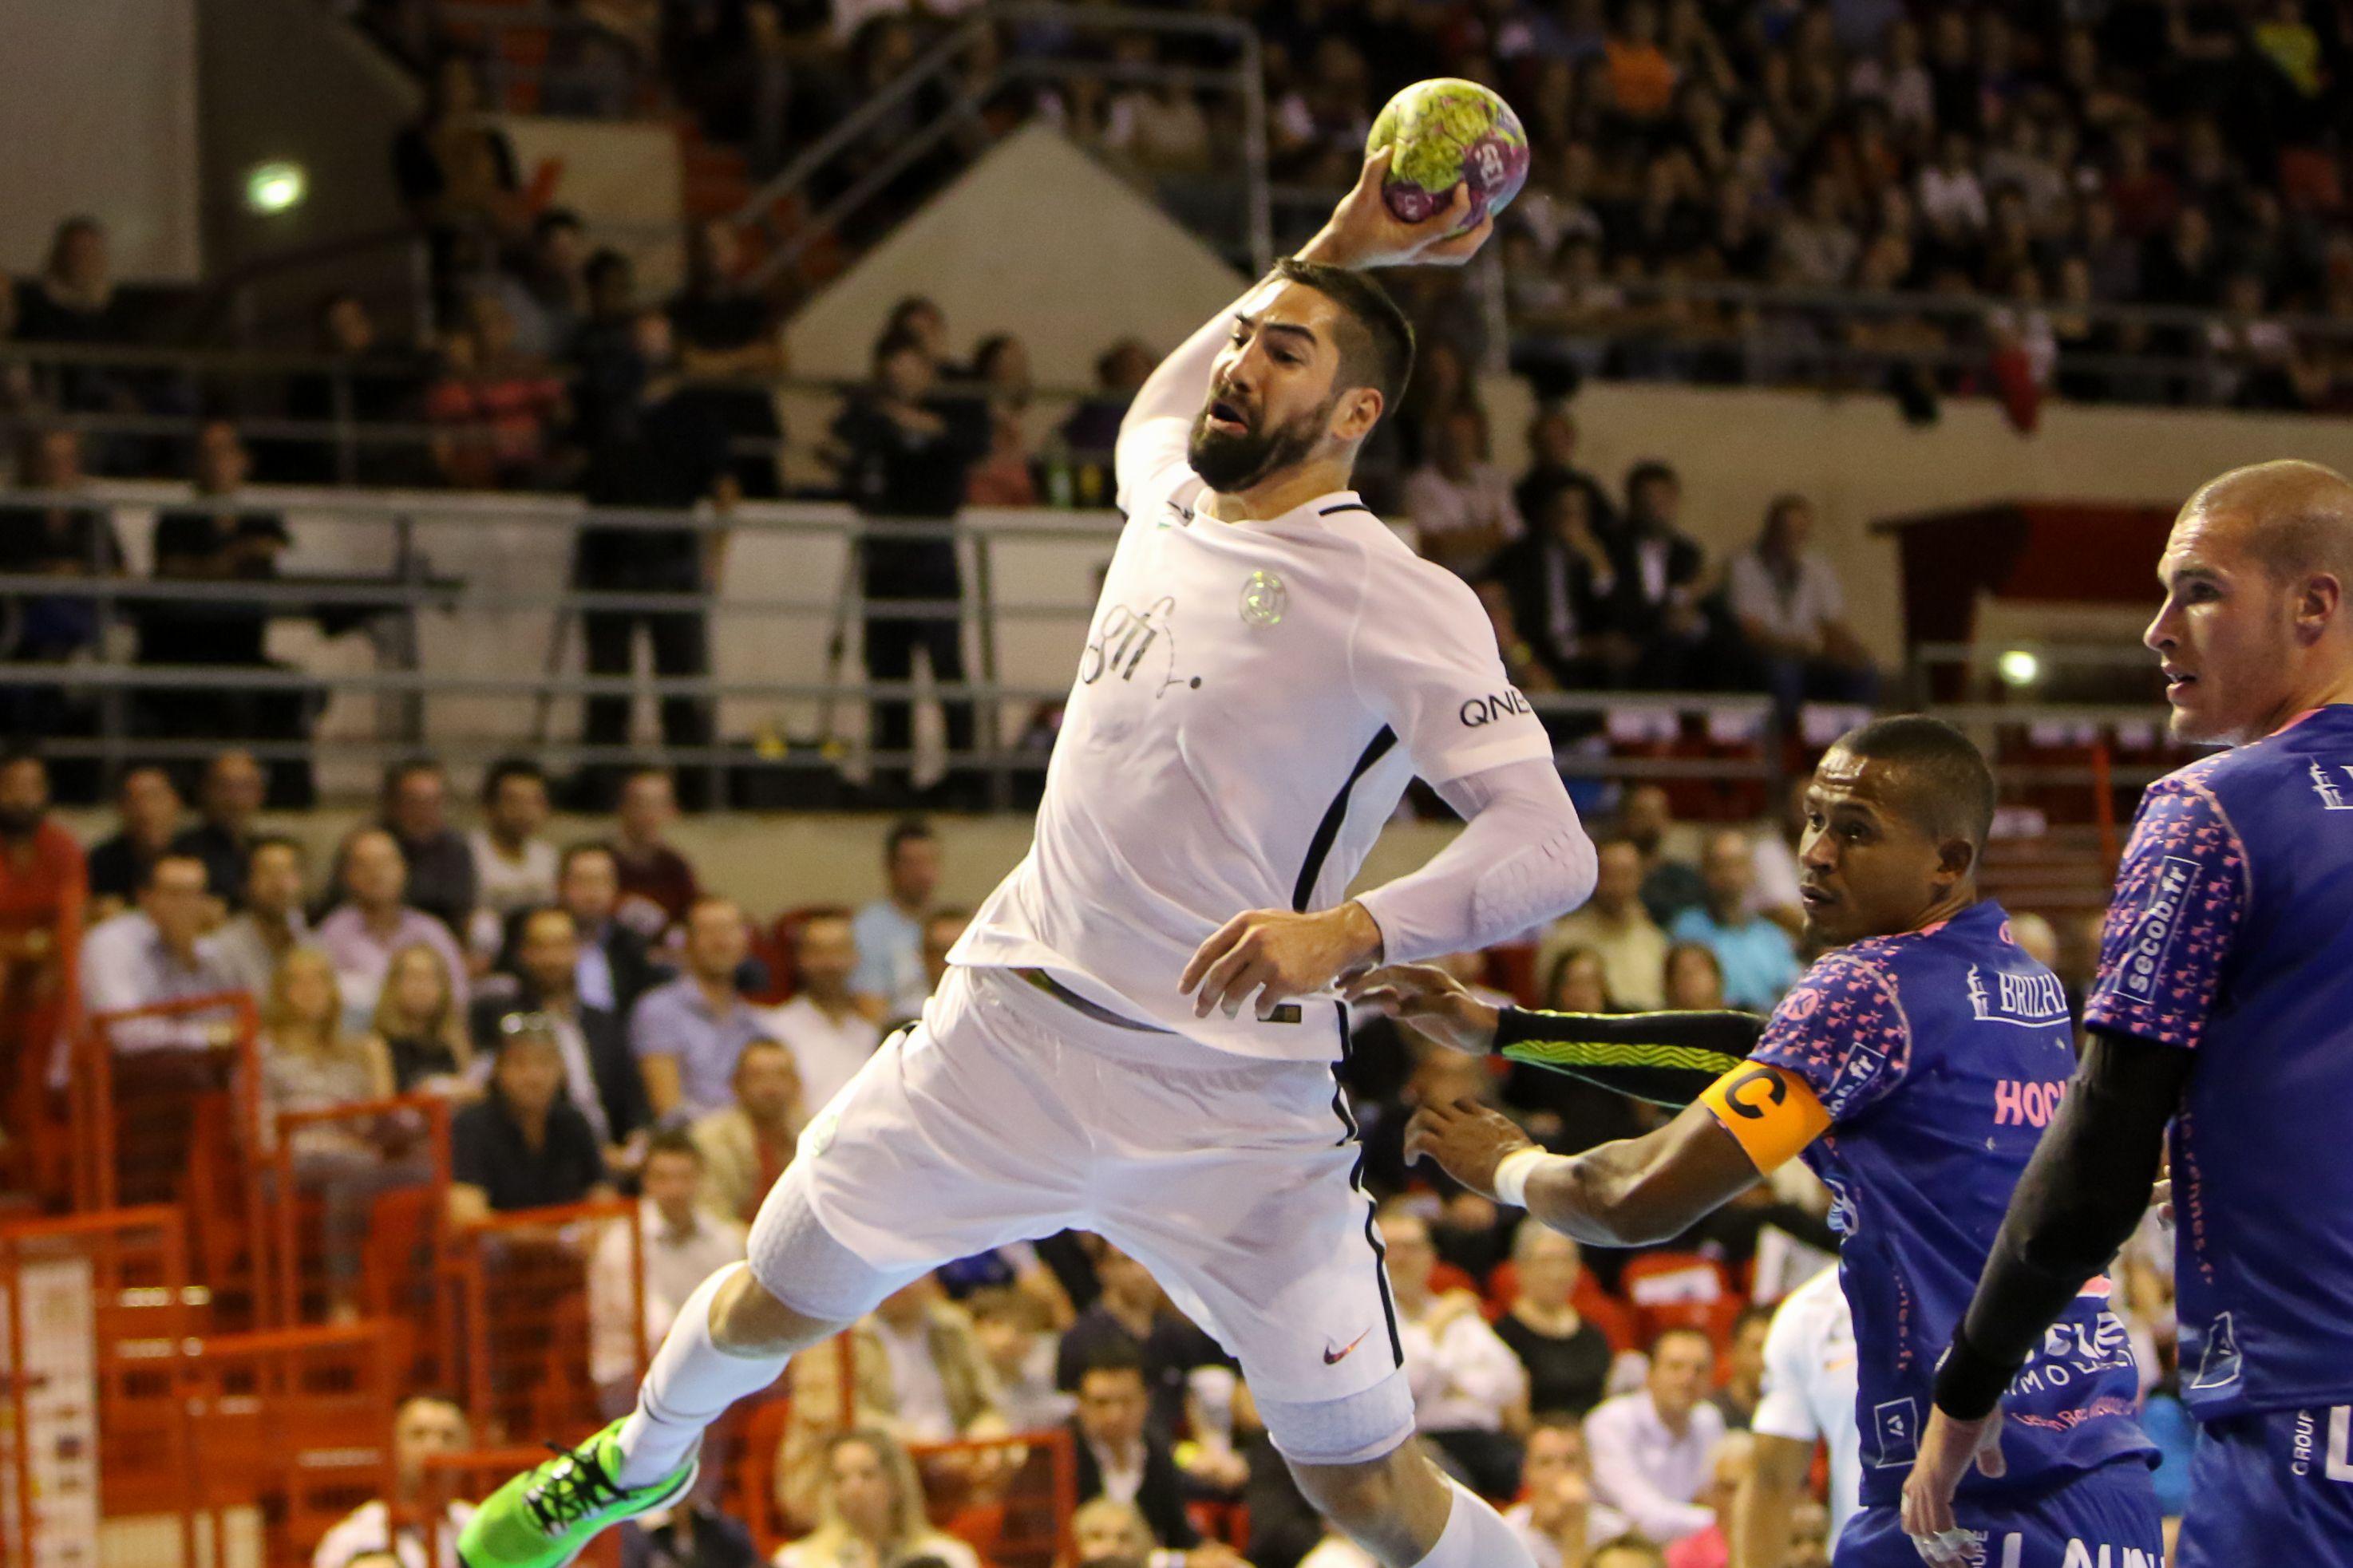 Handball - Division 1 - Retour gagnant pour Nikola Karabatic